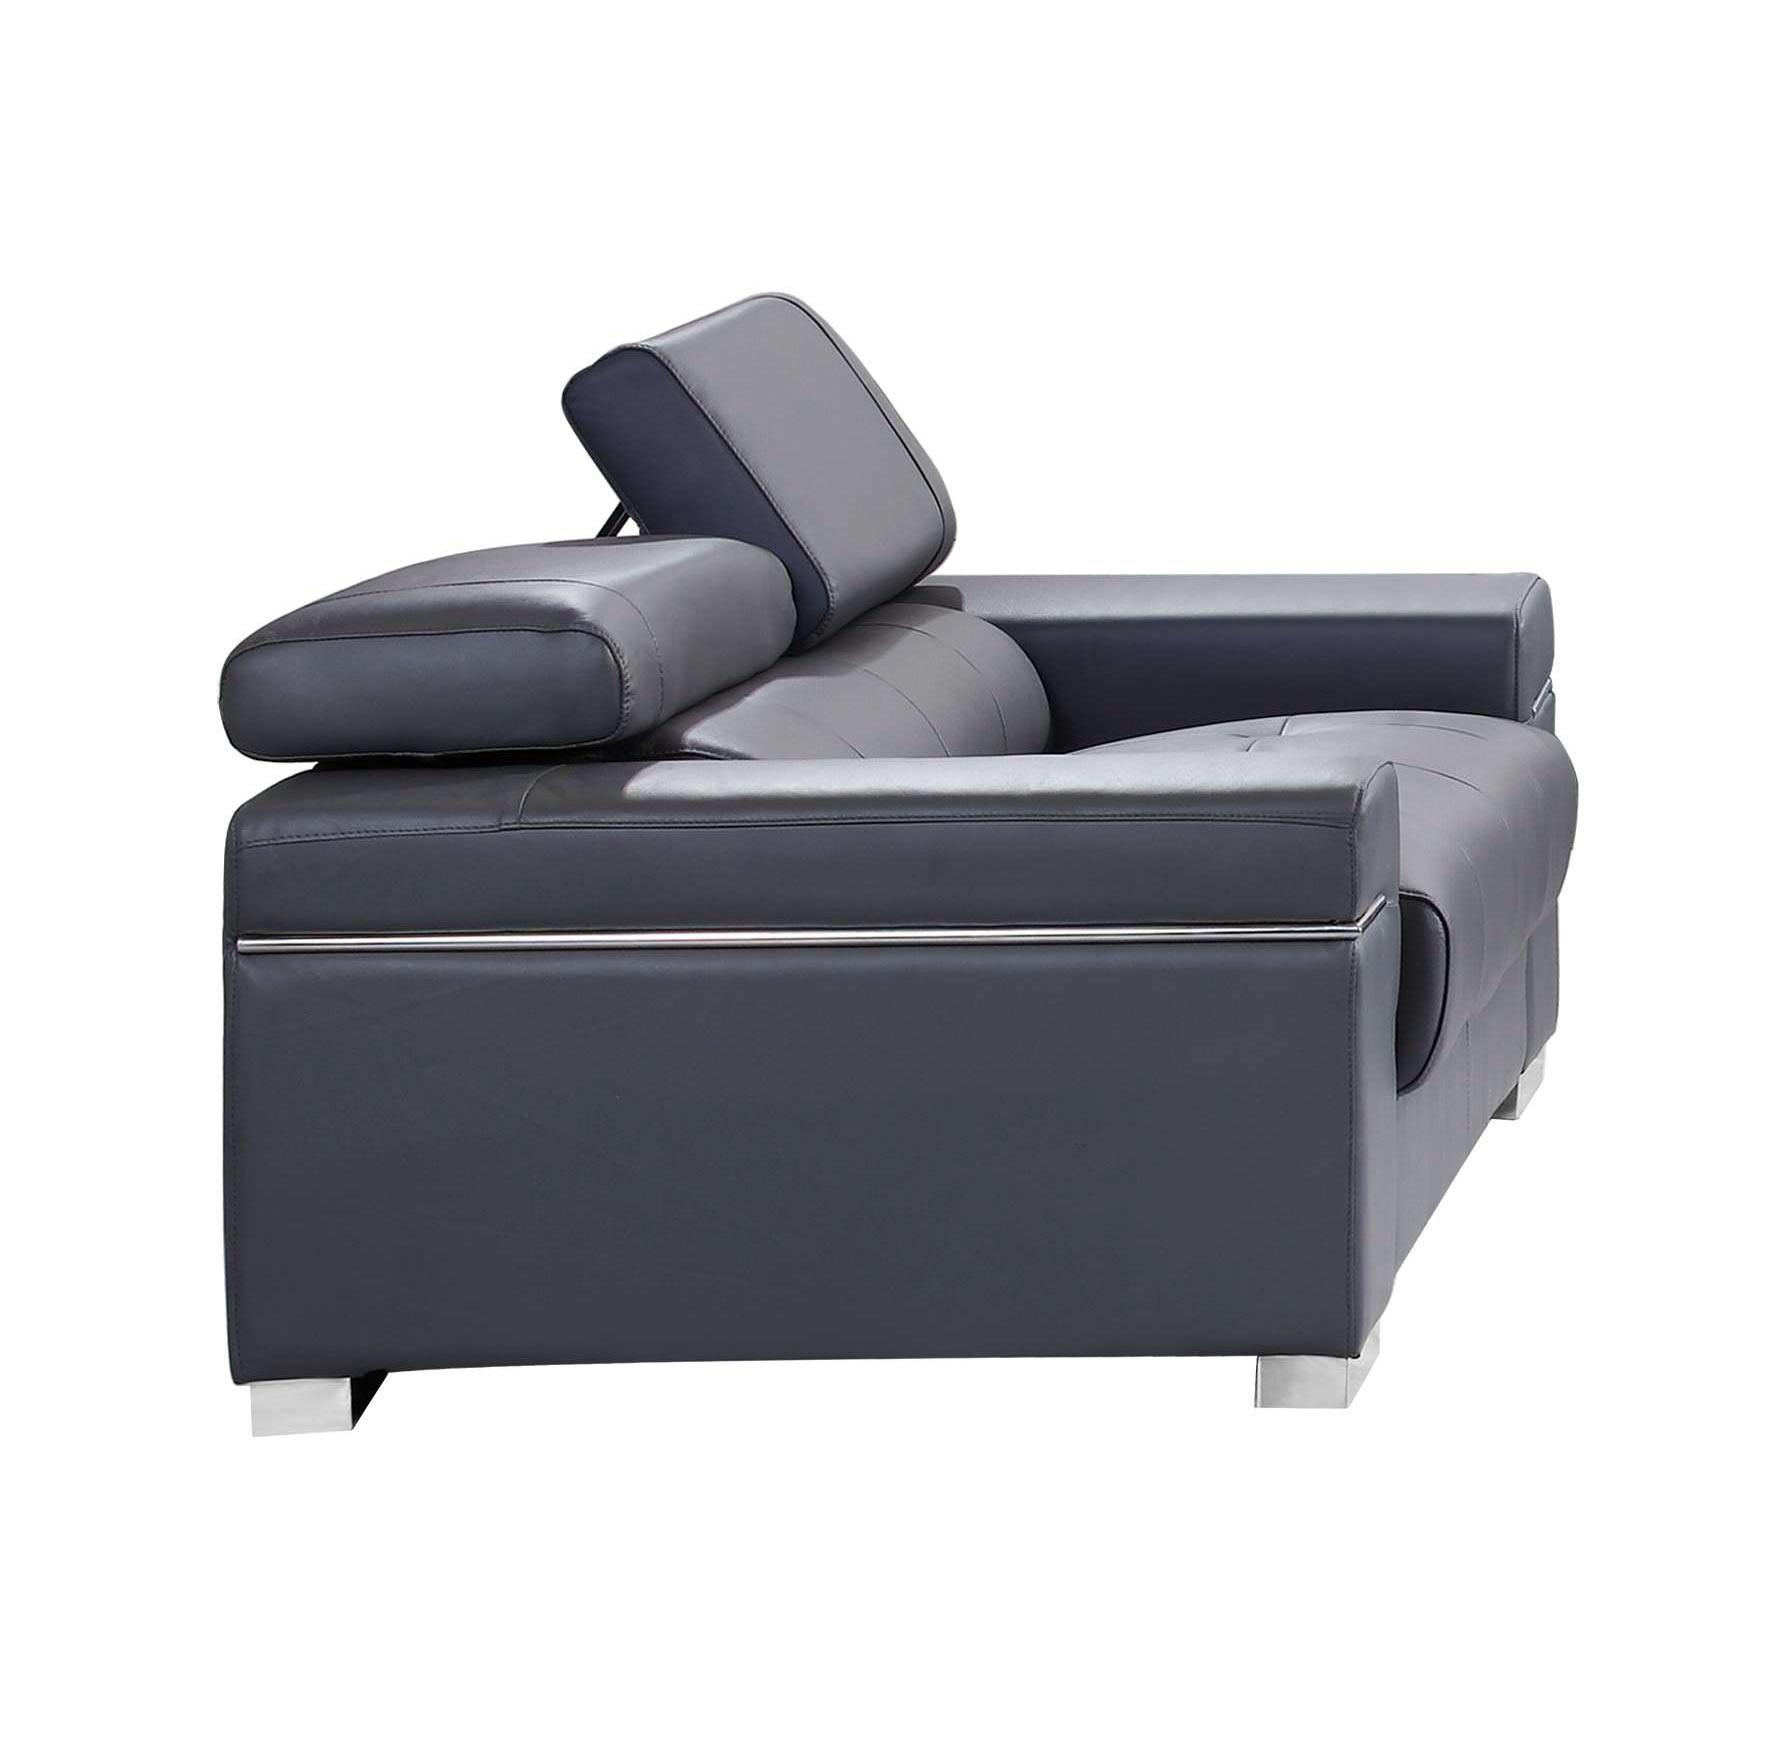 Soho Premium Italian Leather Loveseat Gray By J&M Furniture